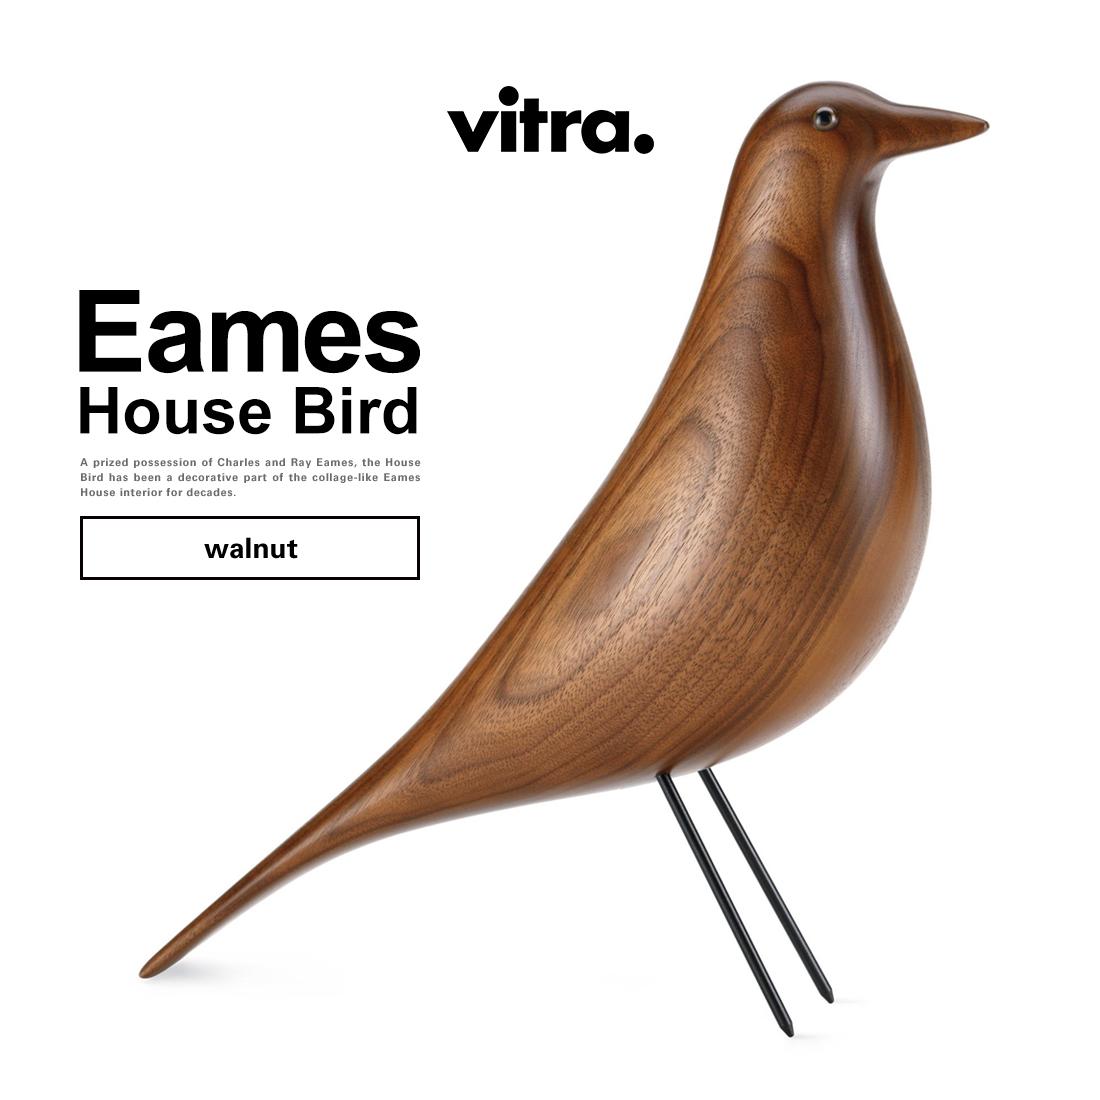 【Vitra】Eames House Bird walnut イームズ ハウスバード ウォルナットヴィトラ/オブジェ/置物/インテリア/Charles & Ray Eames/チャールズ&レイ・イームズ/鳥【コンビニ受取対応商品】